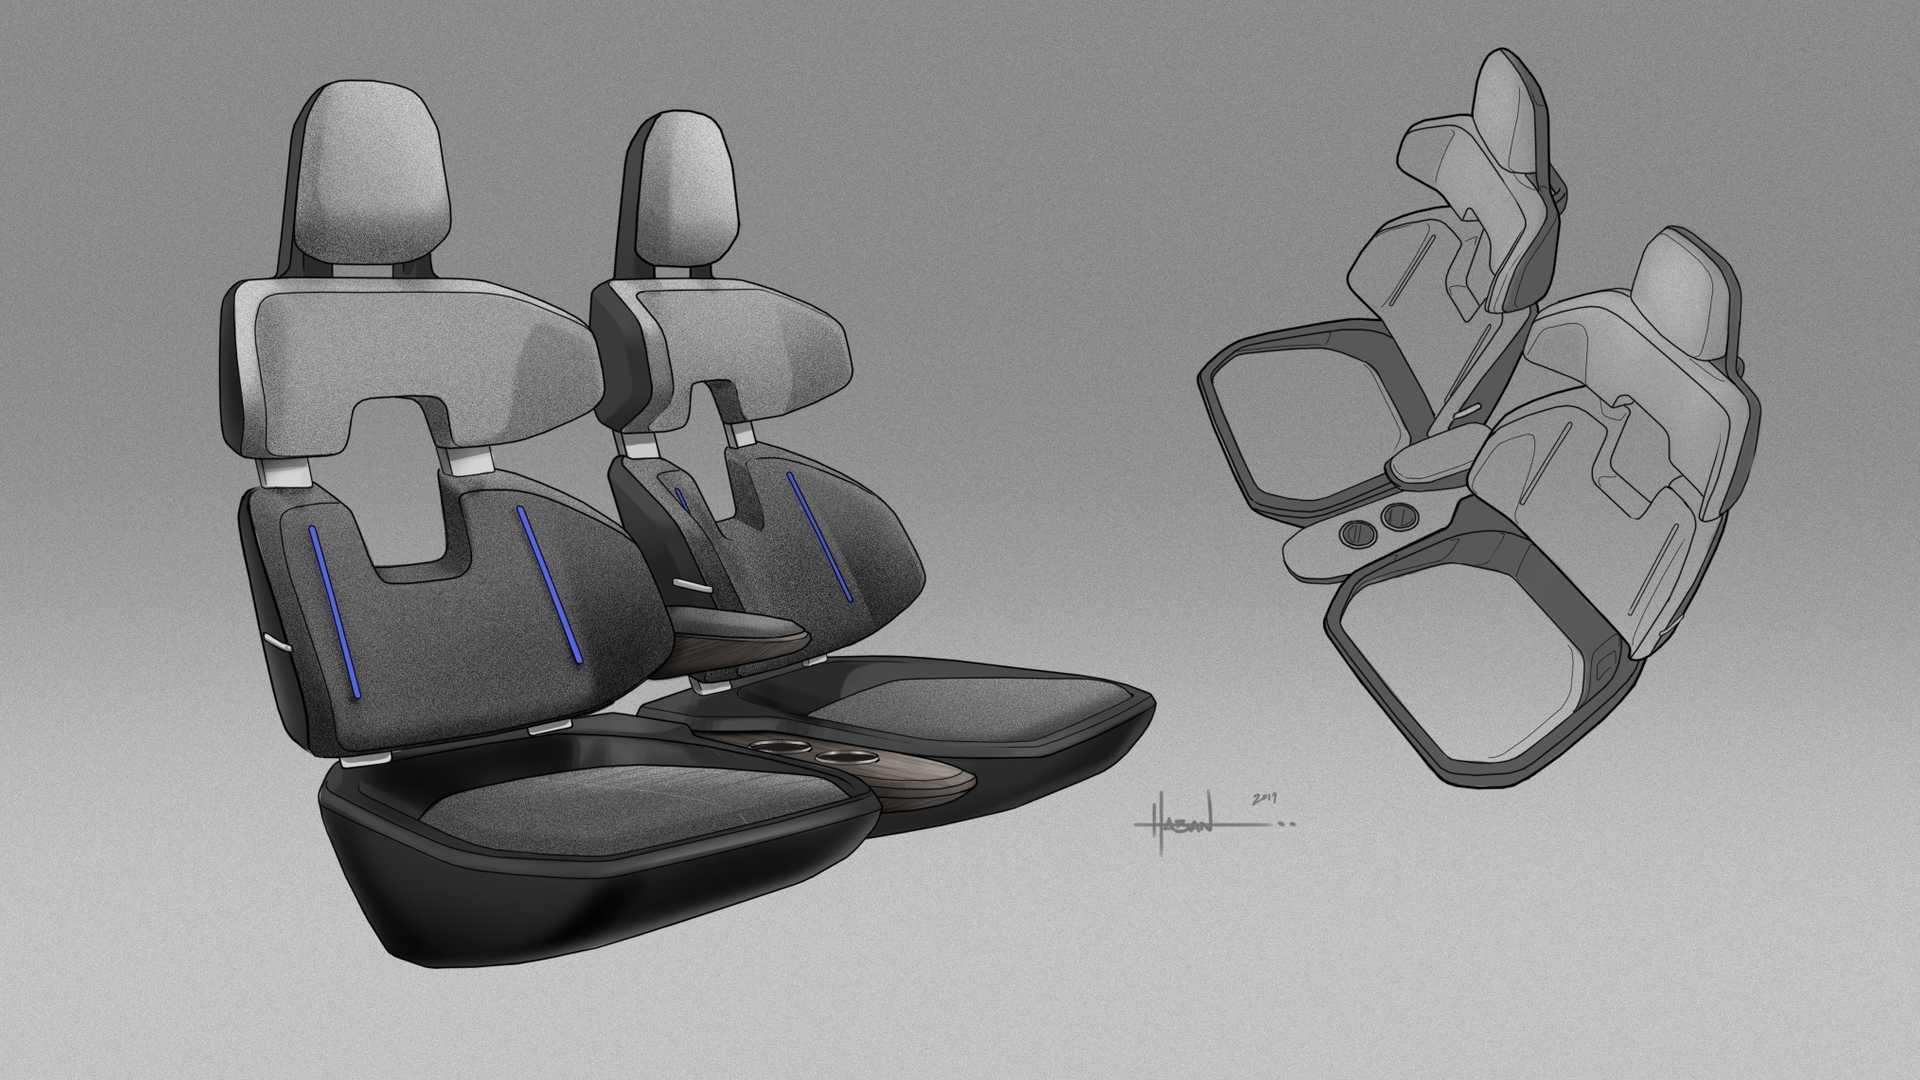 hyundai-uber-ridshare-air-taxi-concept-8